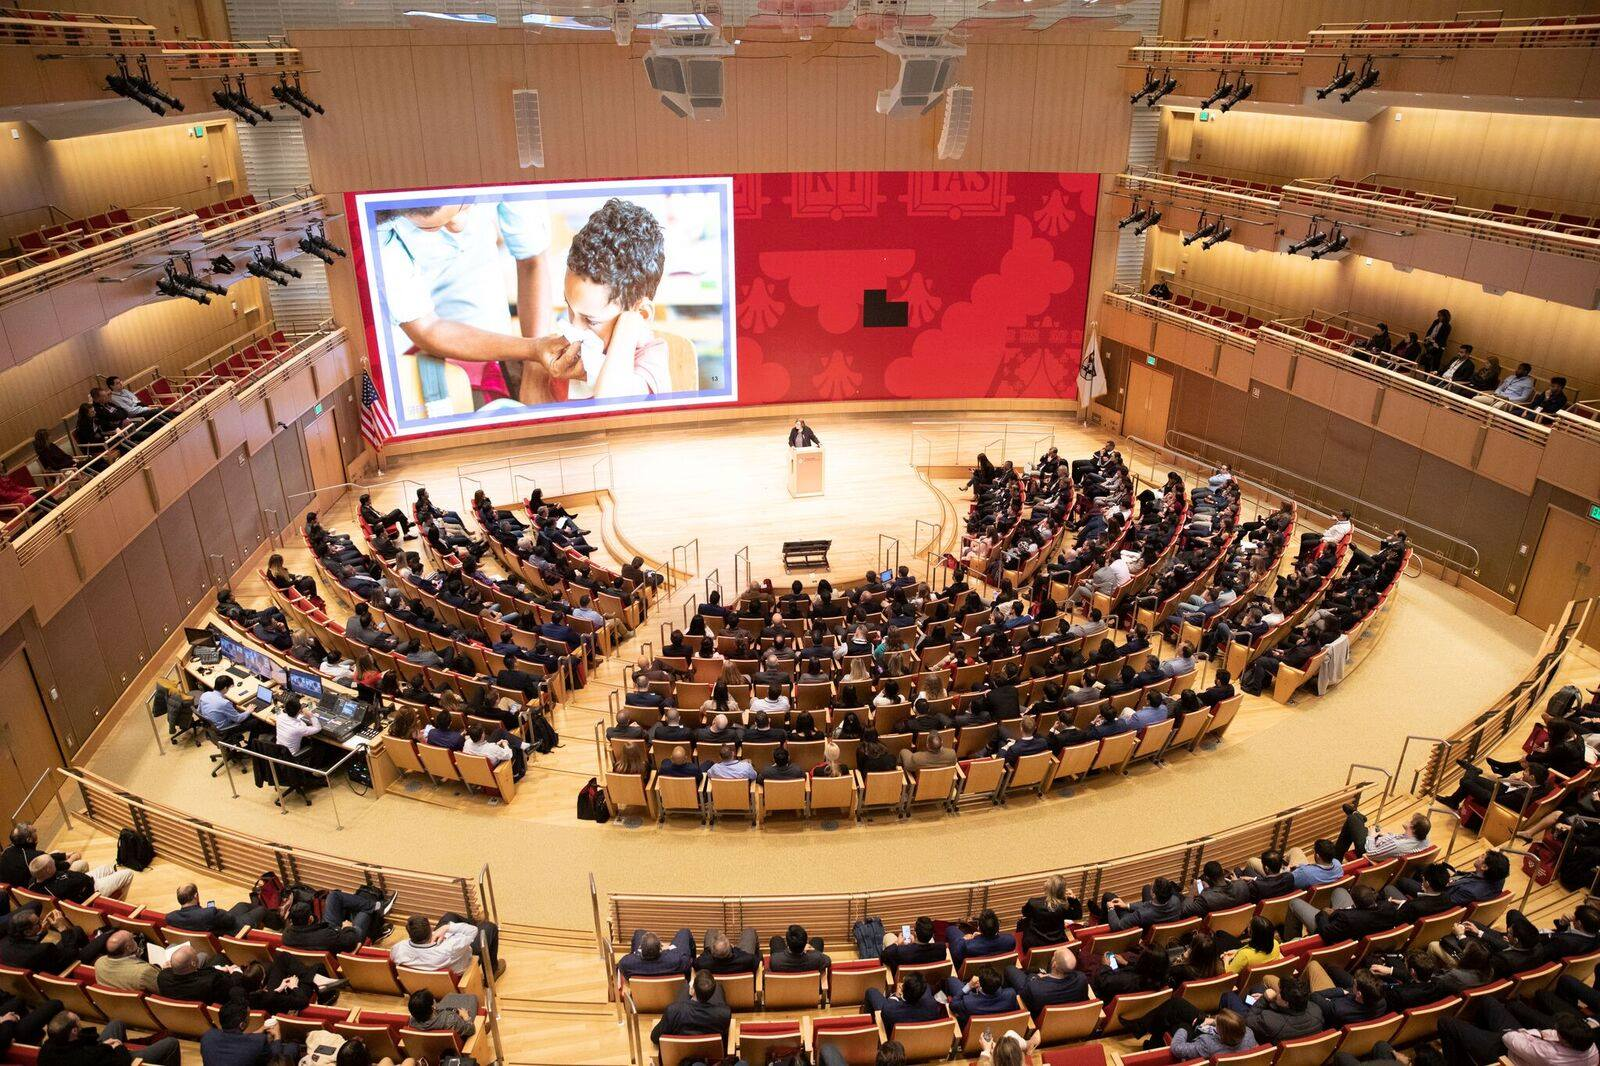 graduation event at Harvard Business School